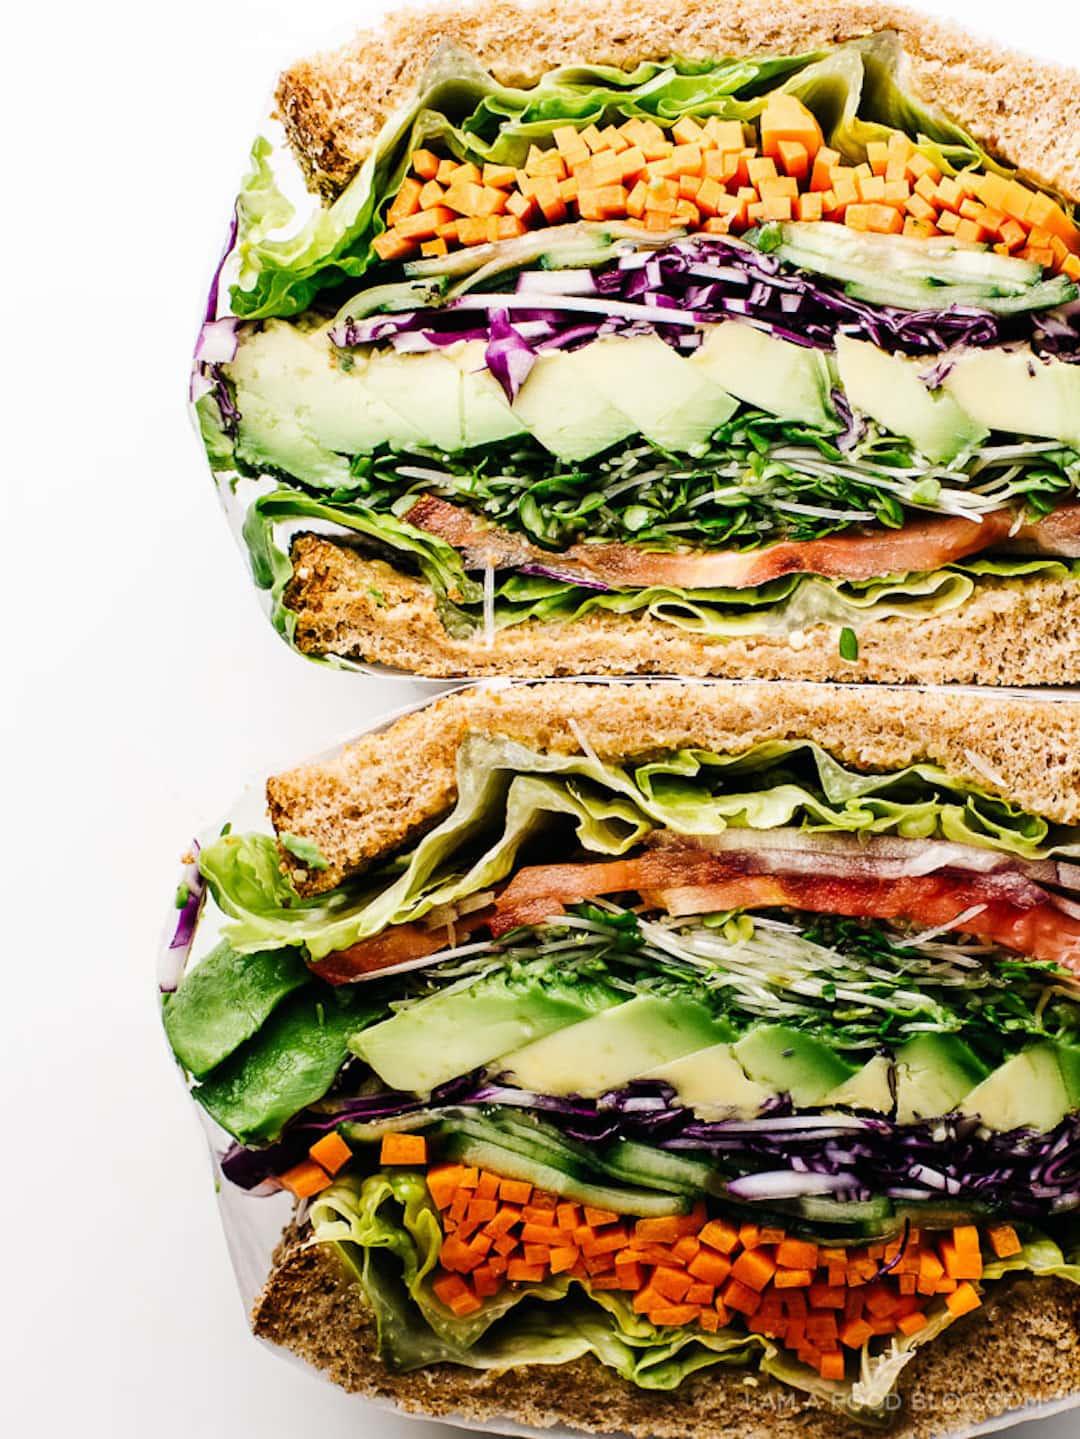 11 Yummy Plant Based Sandwiches - Ultimate Veggie Sandwich by I'm A Food Blog